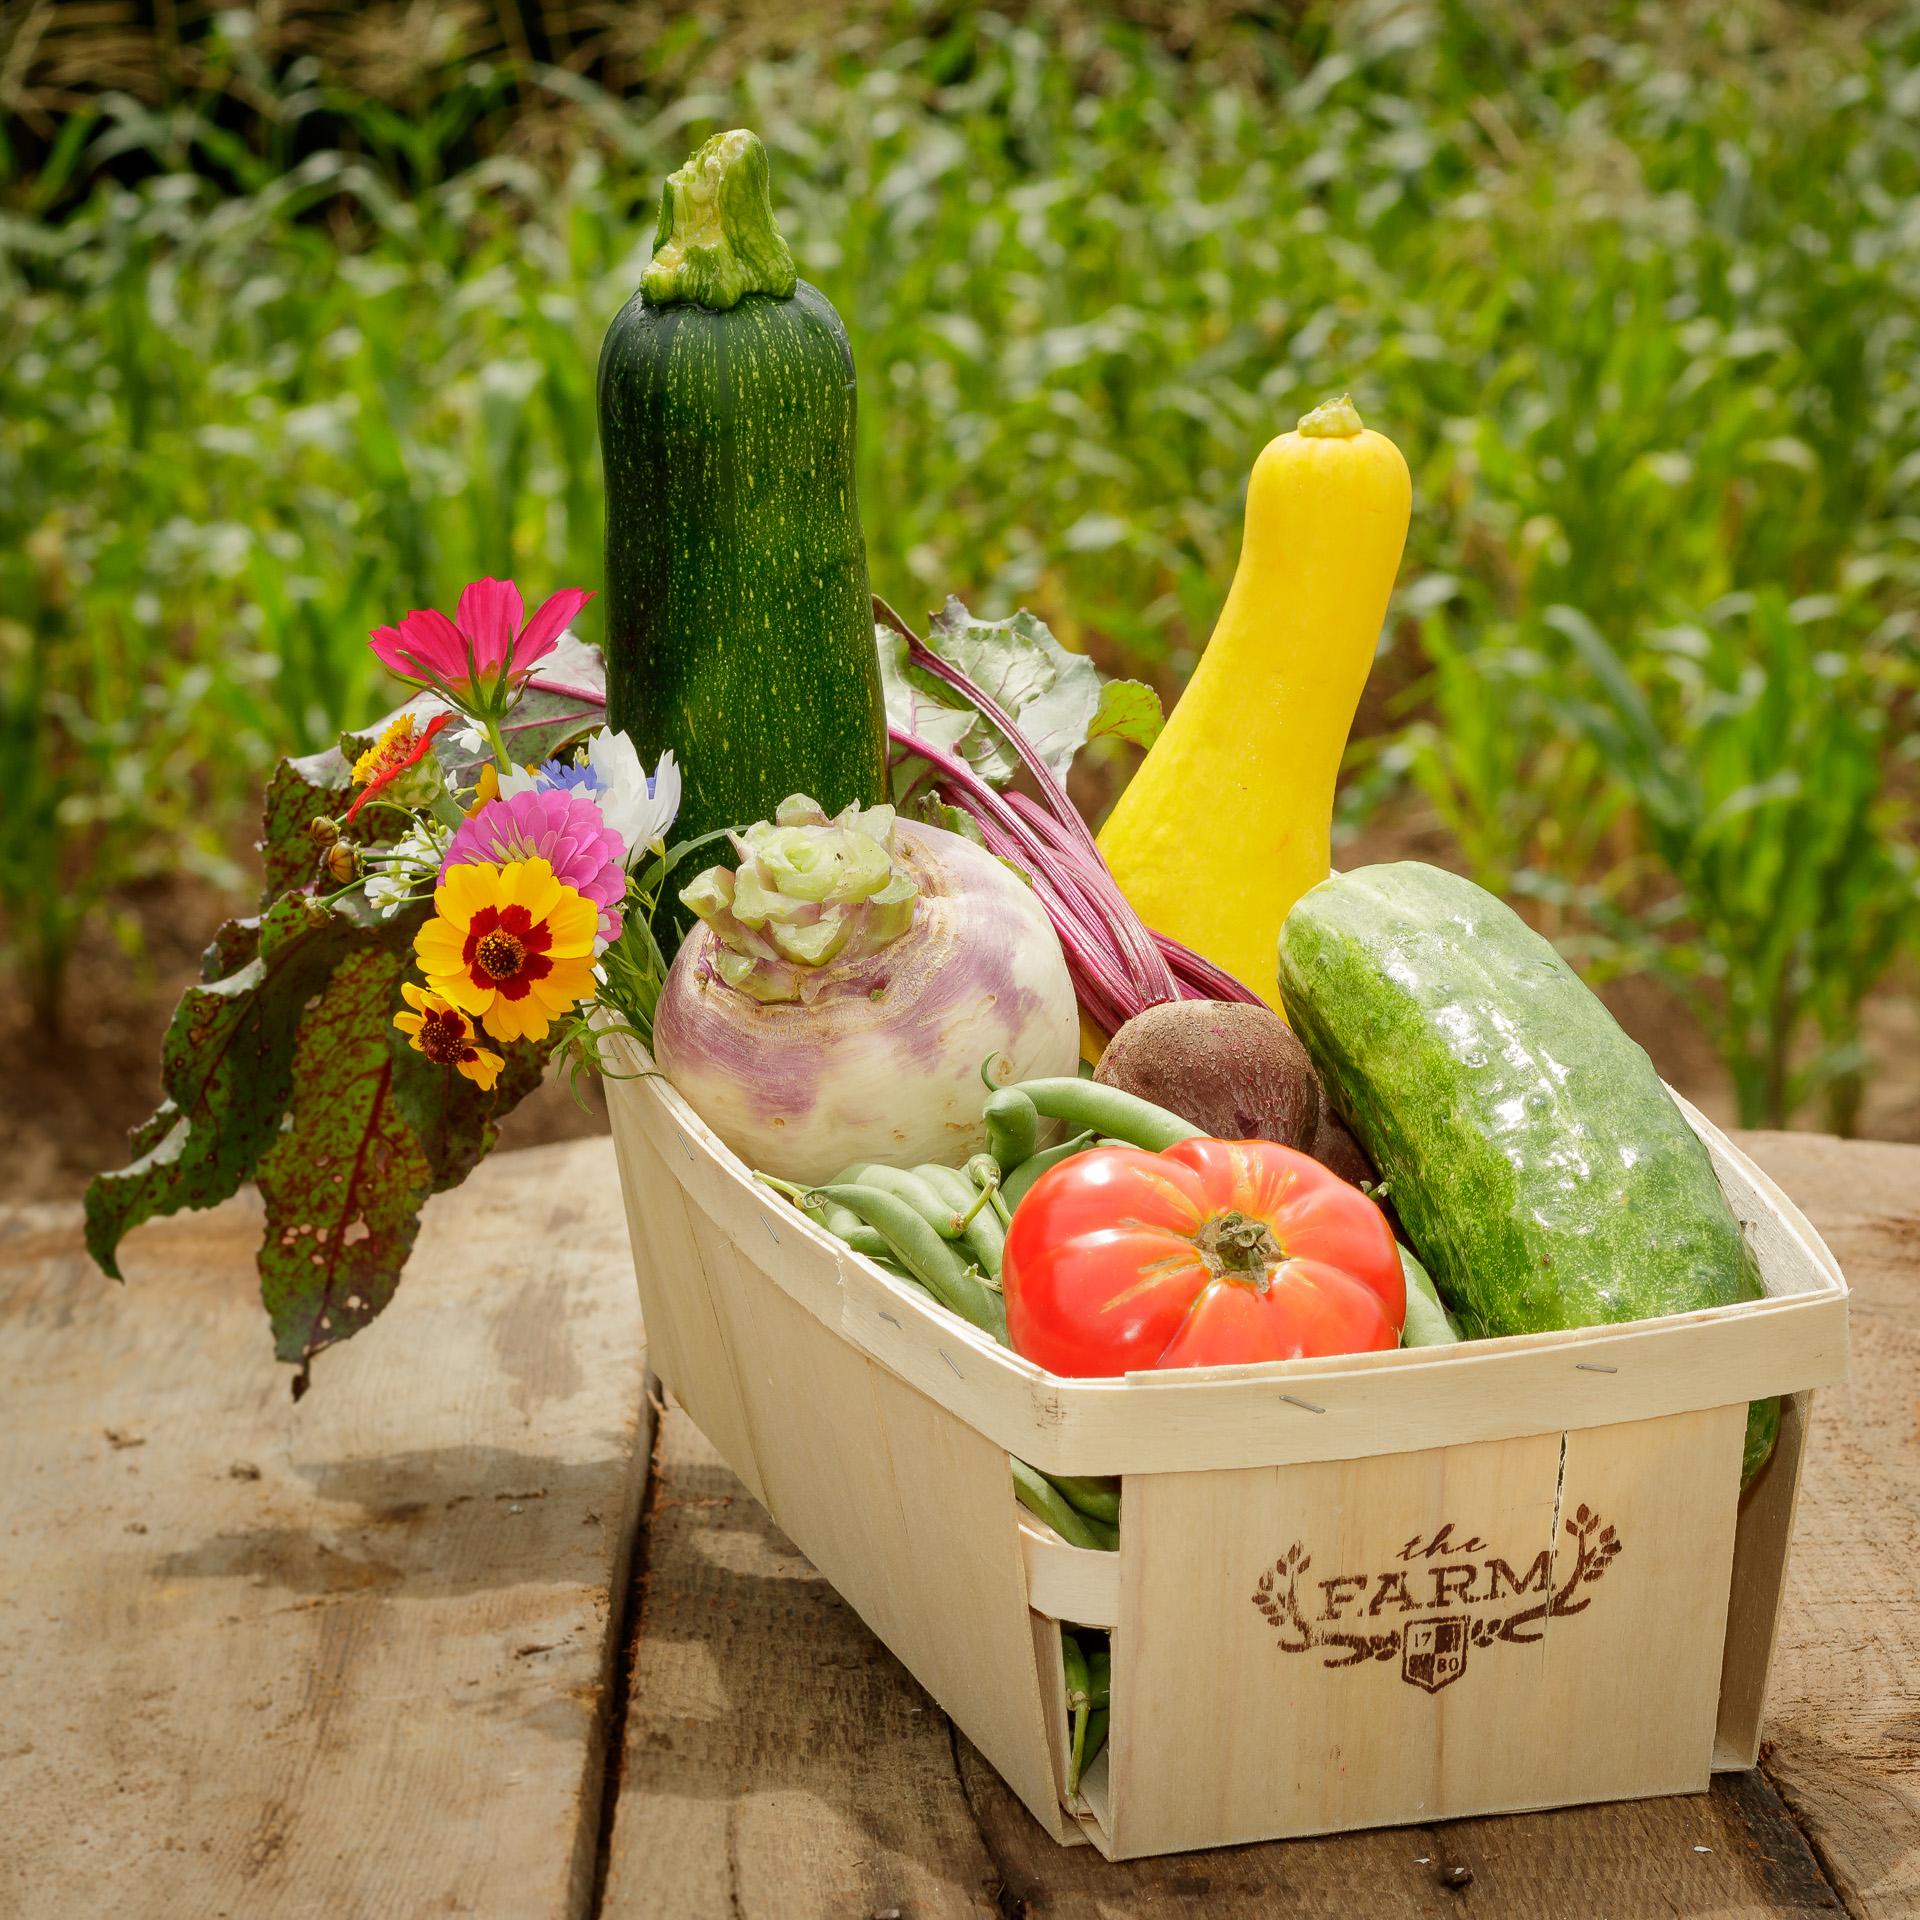 Fresh Seasonal Veggies